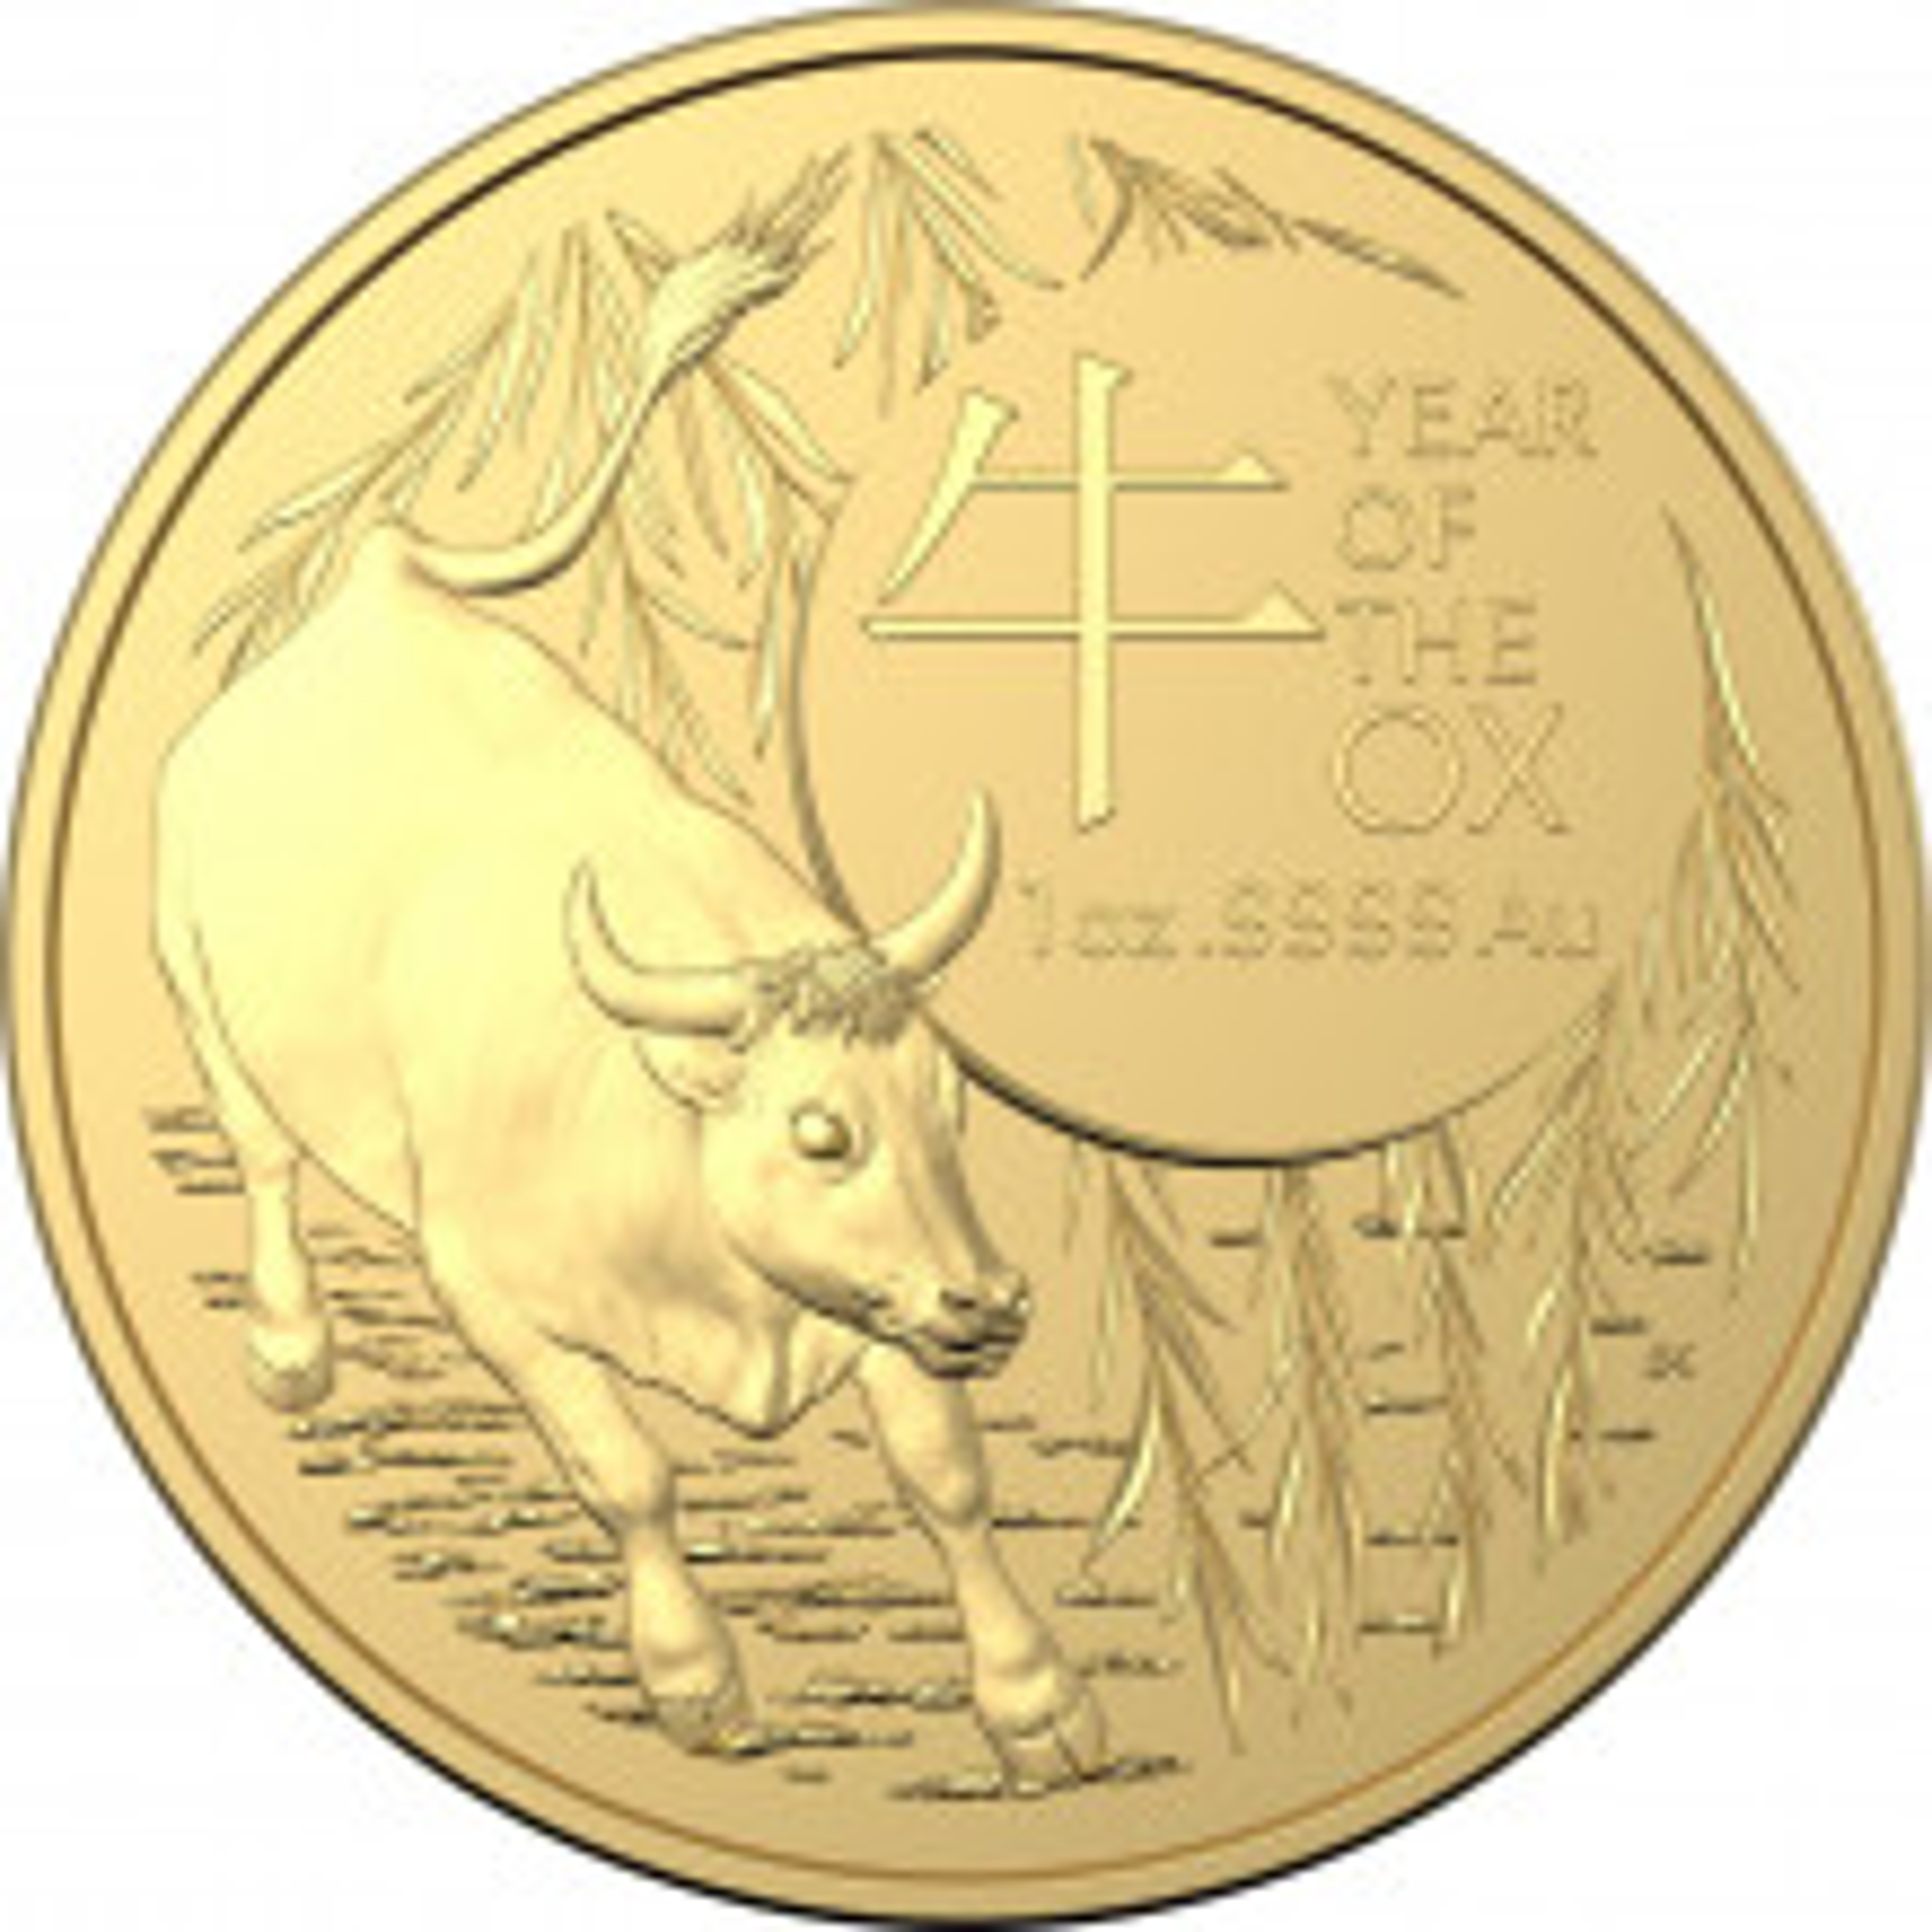 1 troy ounce gouden munt Lunar RAM serie Os 2021